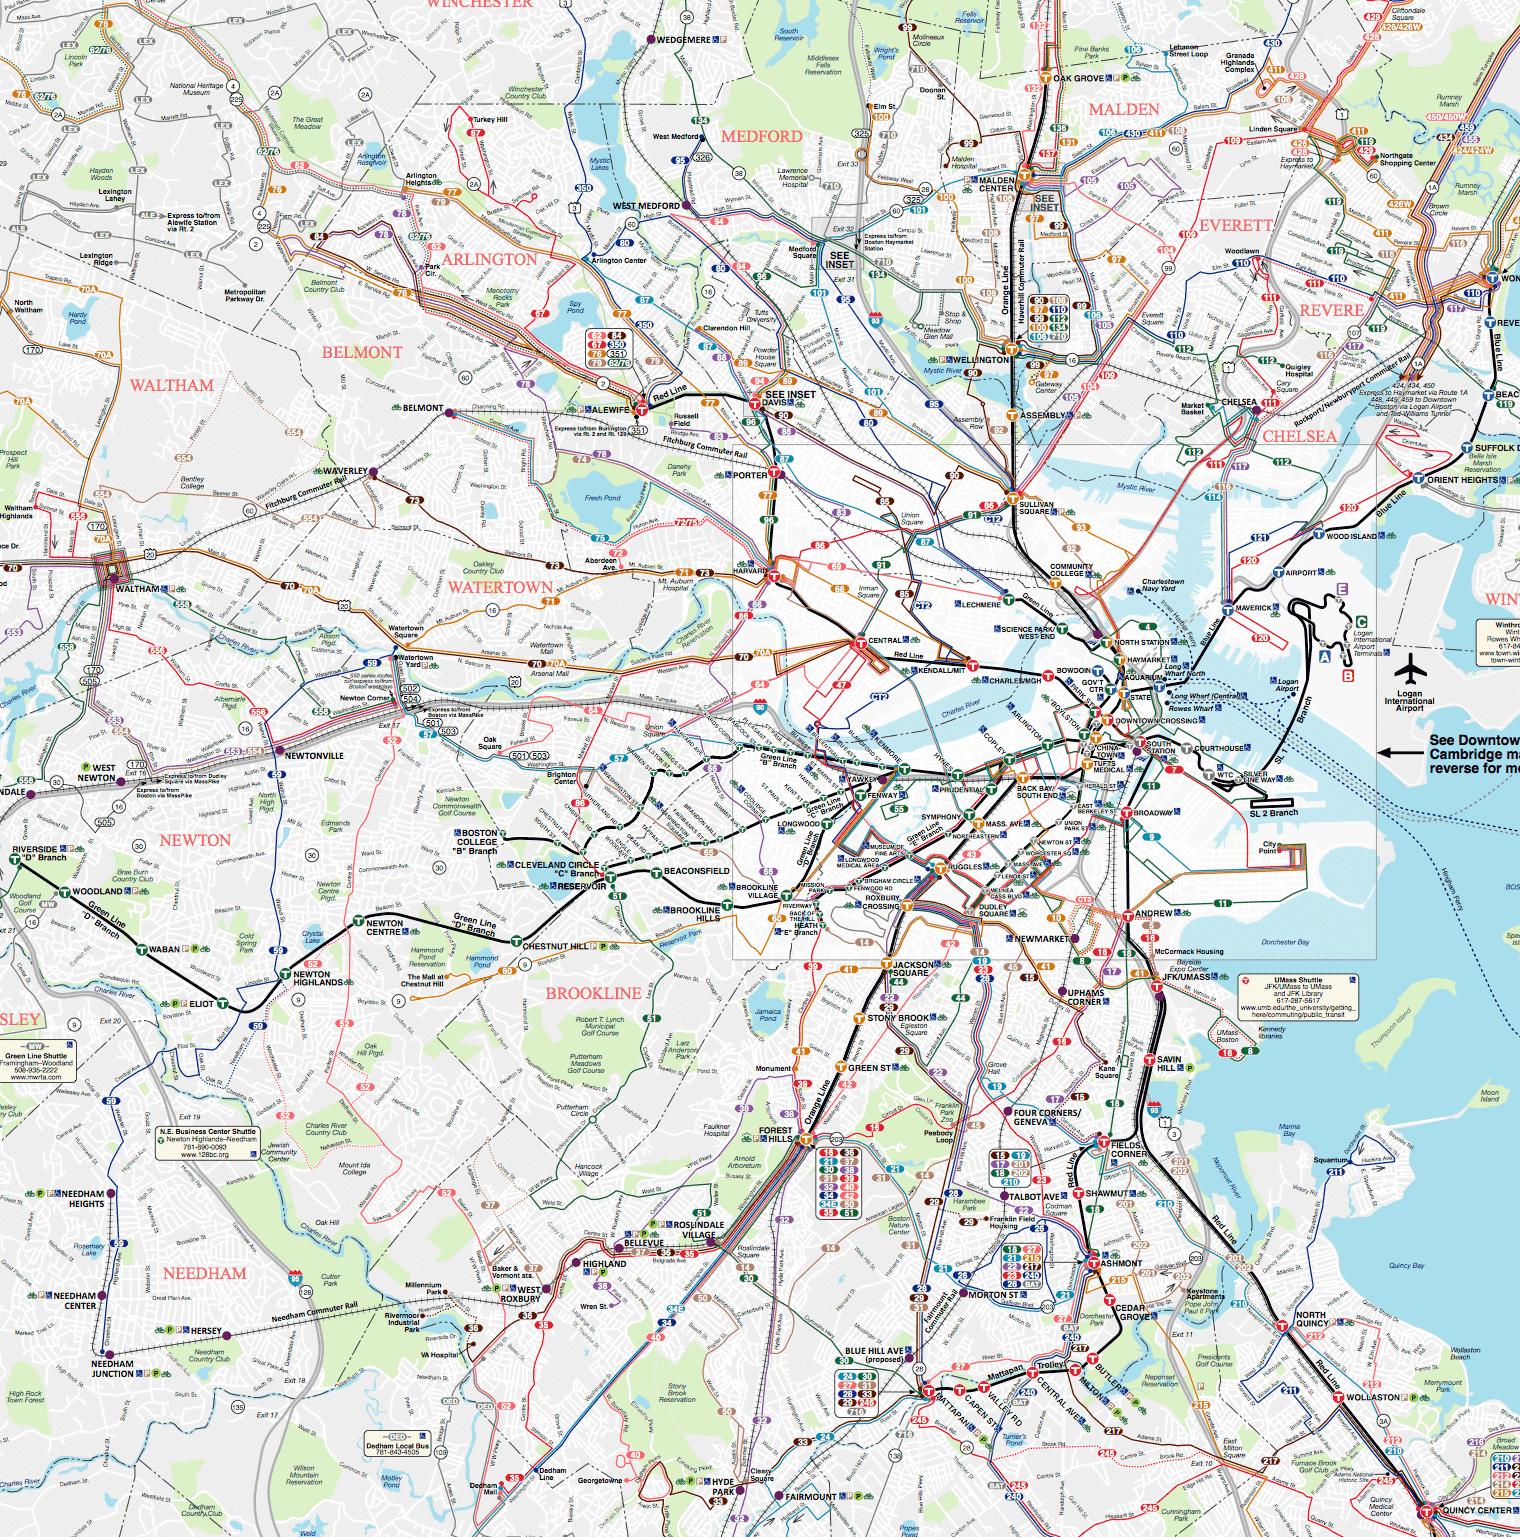 Maps Home MBTA Massachusetts Bay Transportation Authority - Large us road wall map